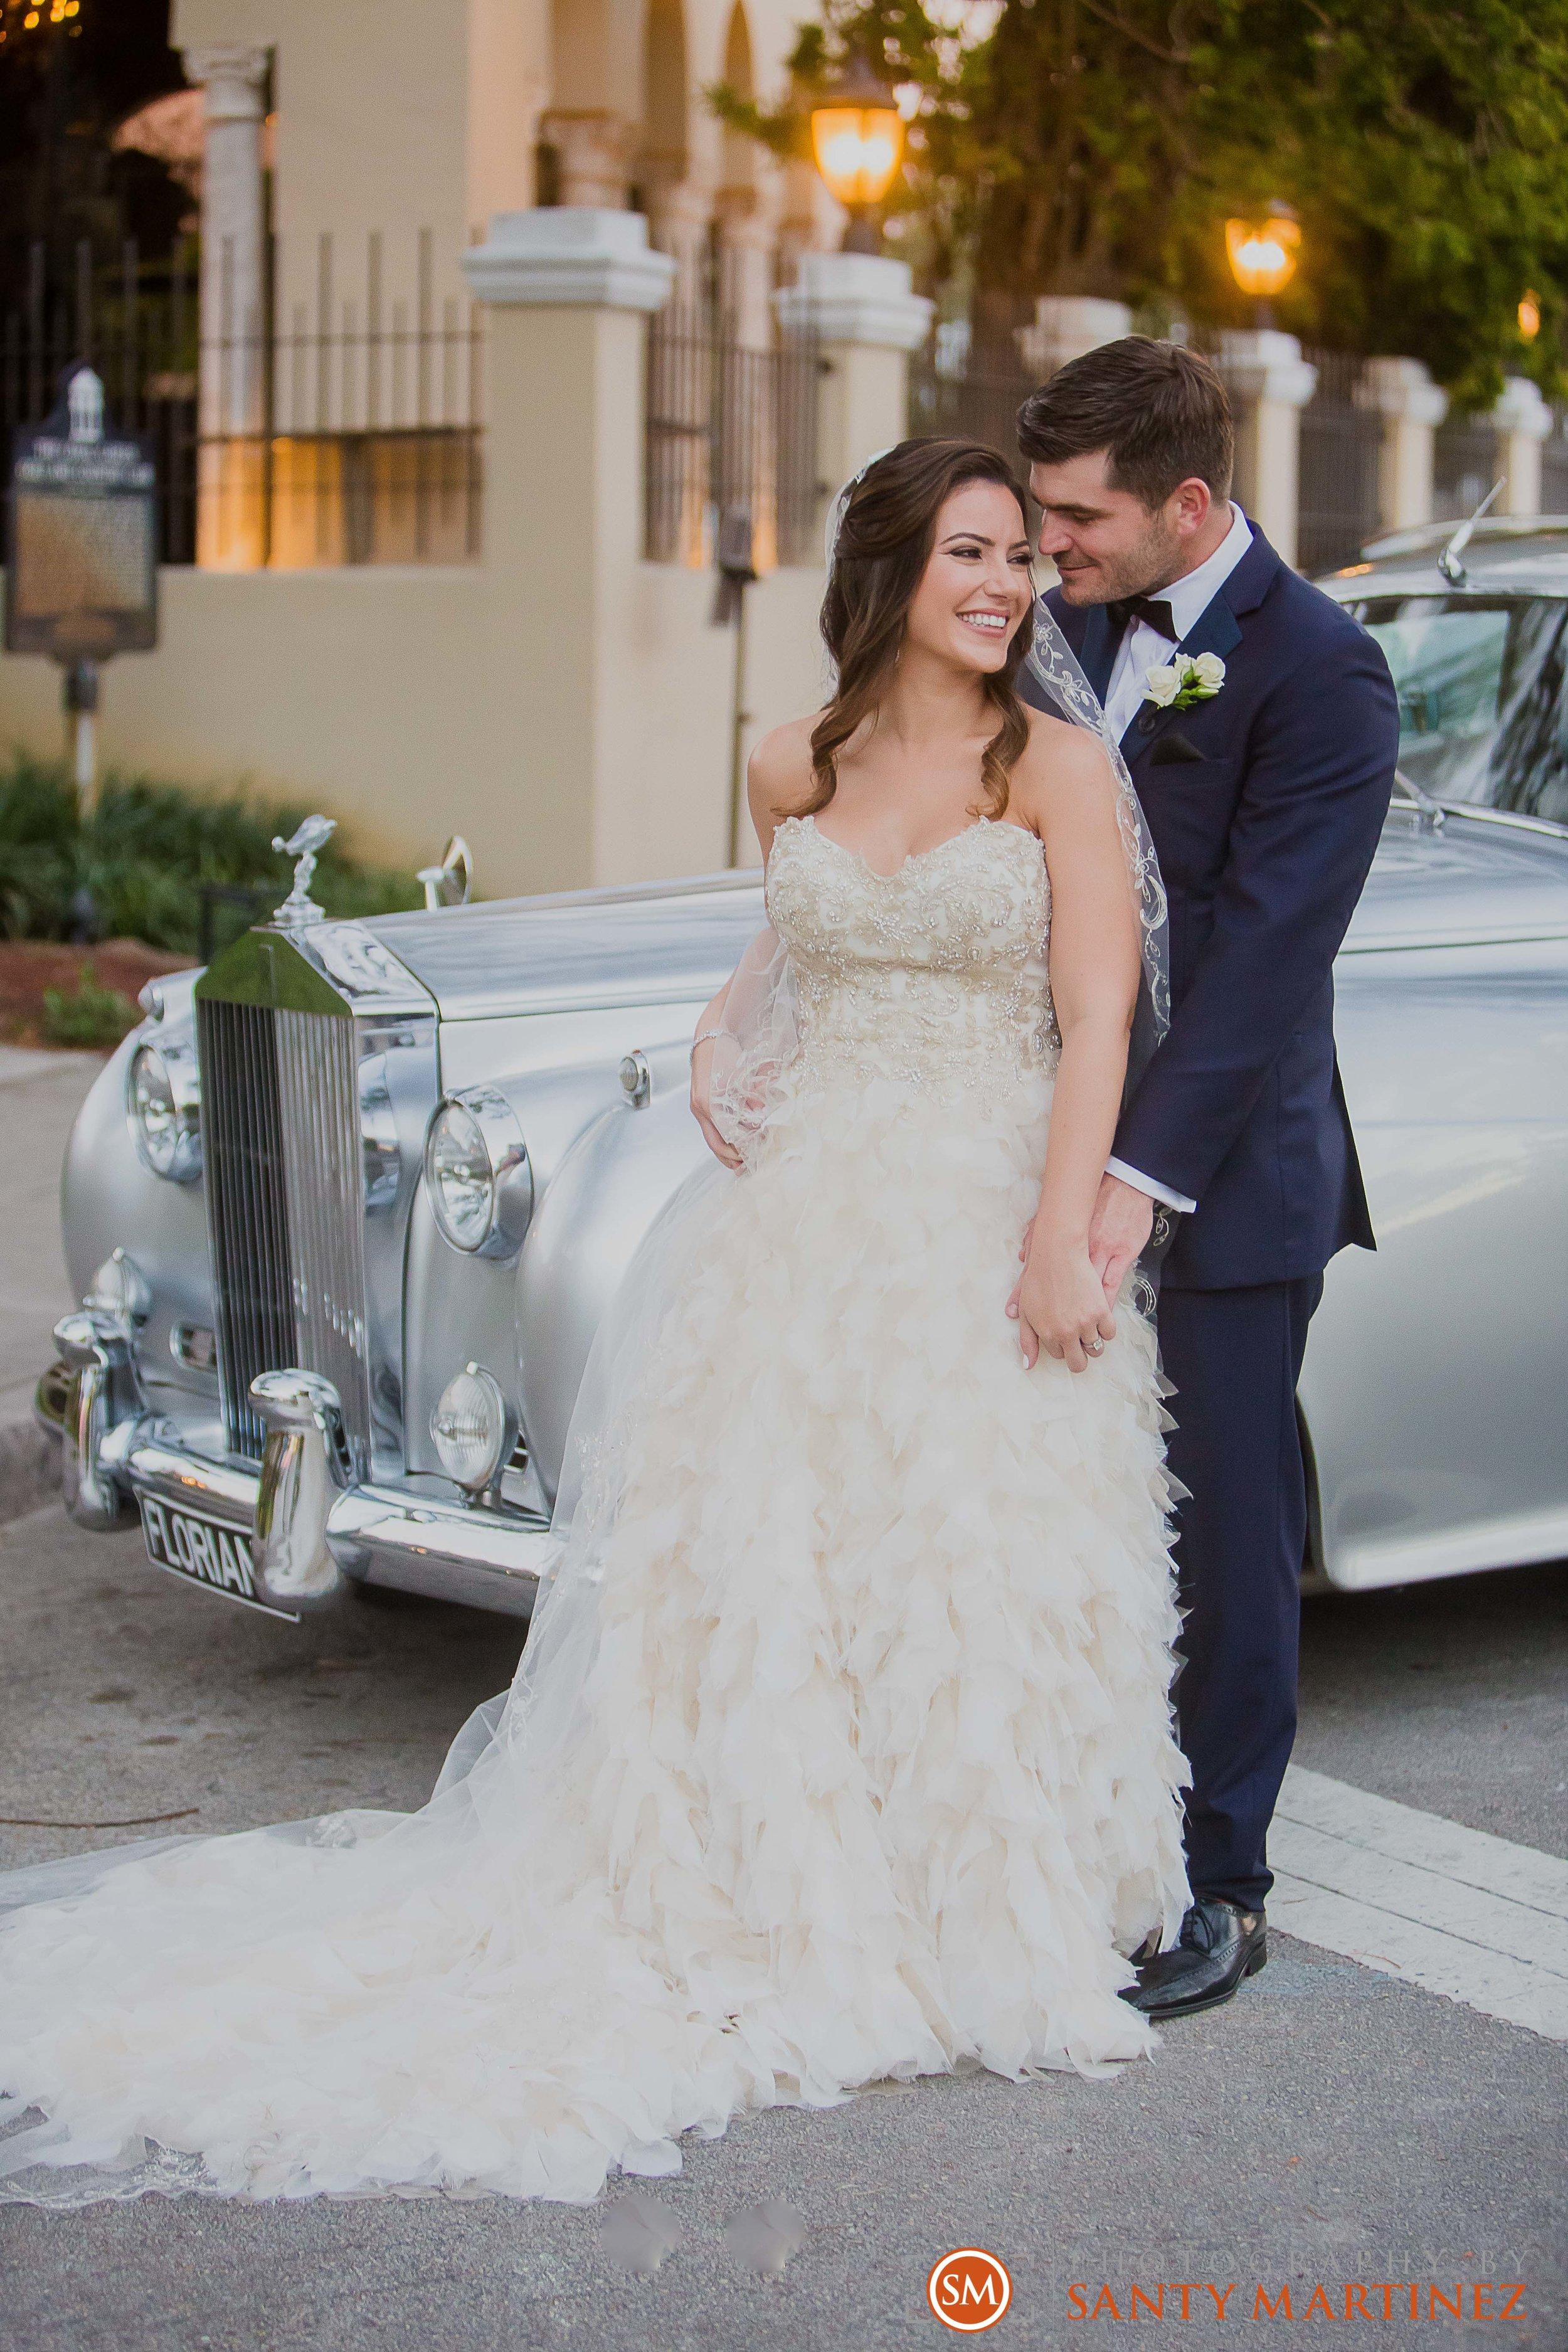 Wedding Coral Gables Country Club - Santy Martinez Photography-22.jpg